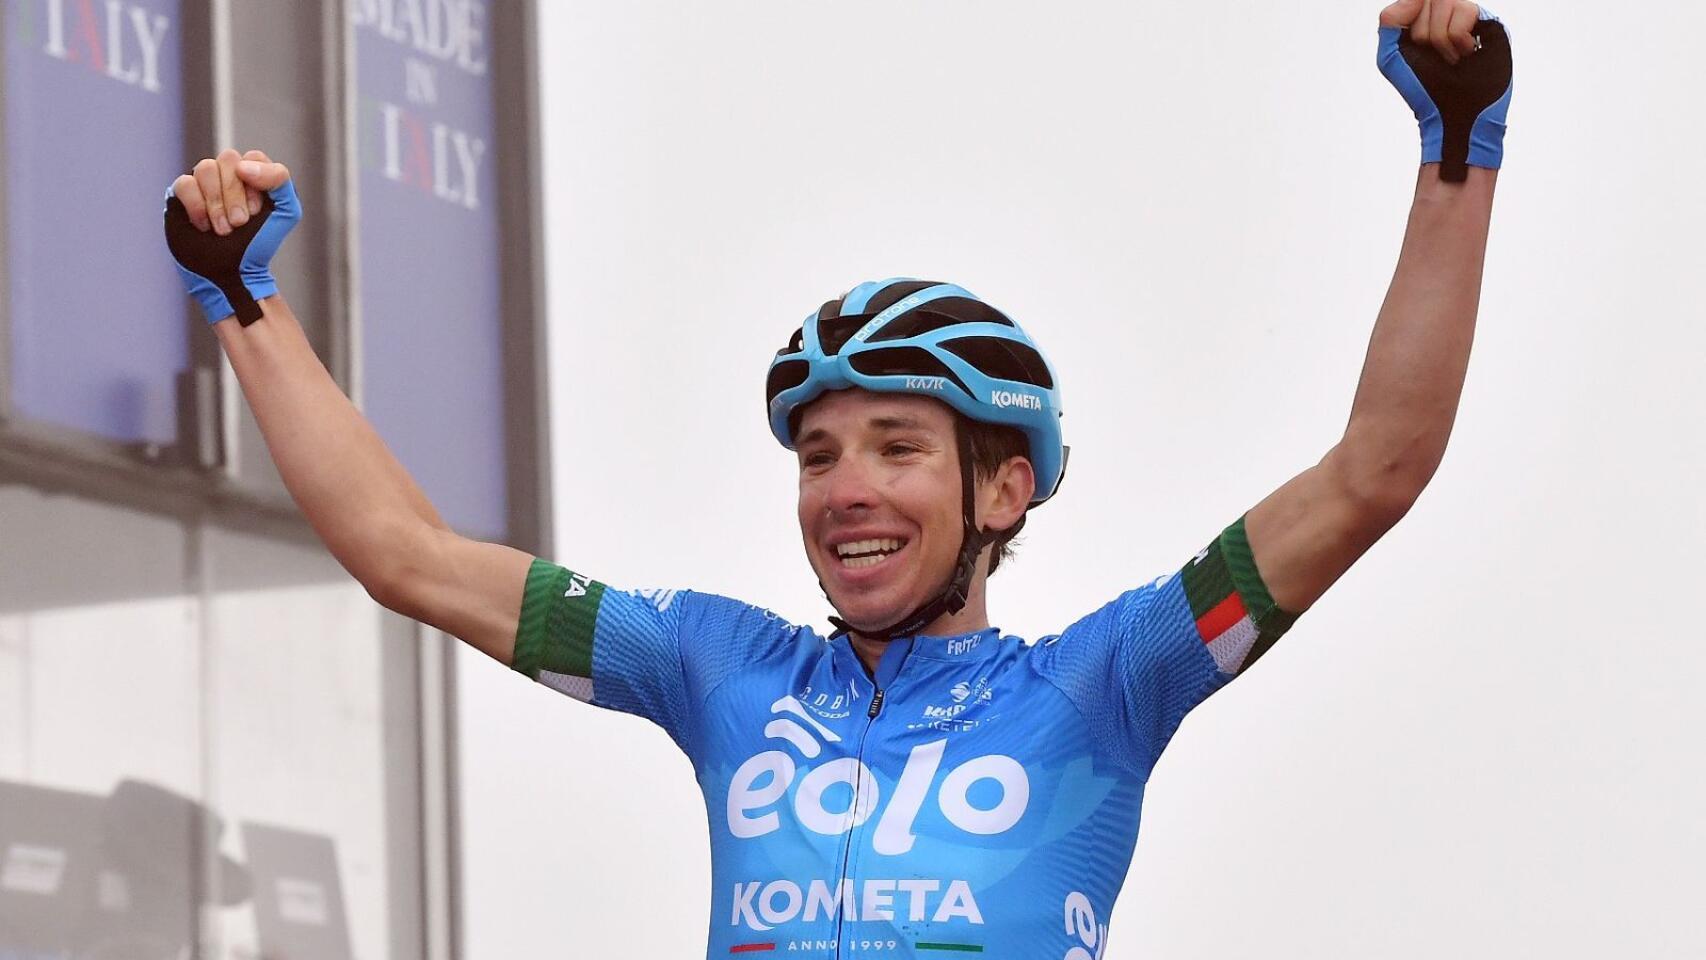 Eolo-Kometa Cycling Team rider Lorenzo Fortunato of Italy celebrates after winning Stage 14 of the Giro d'Italia